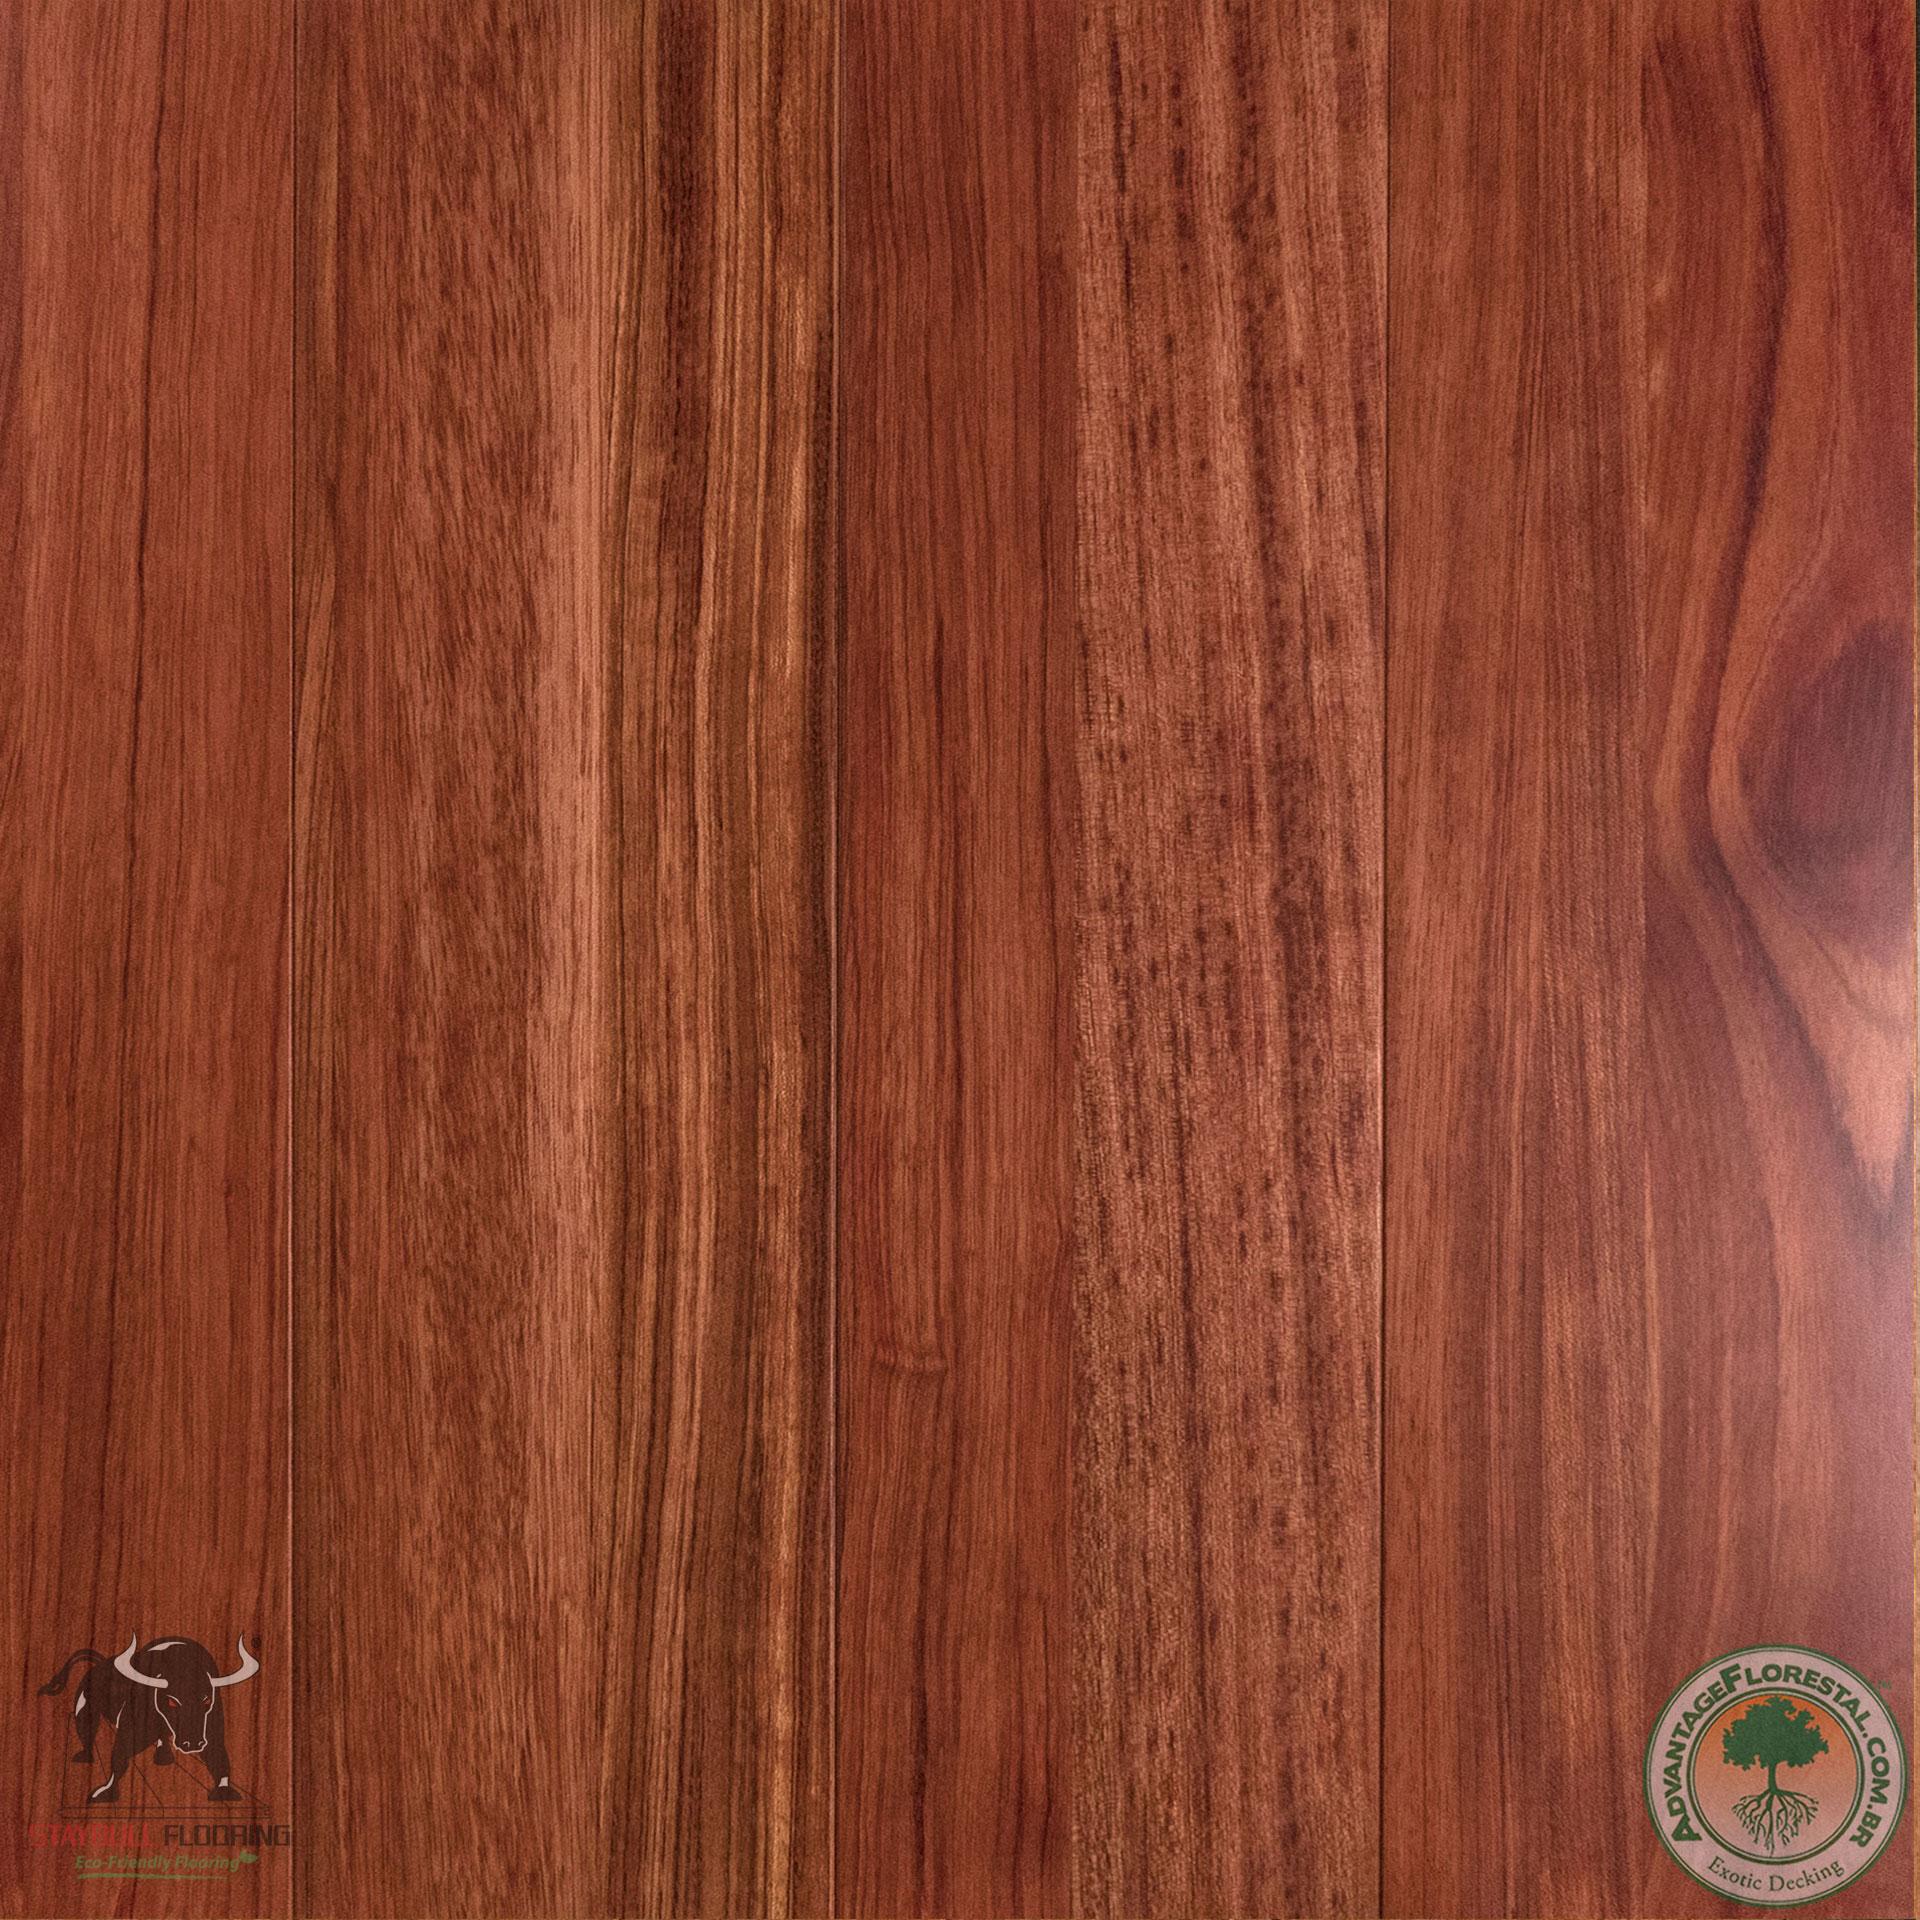 Wholesale Bubinga Hardwood Flooring